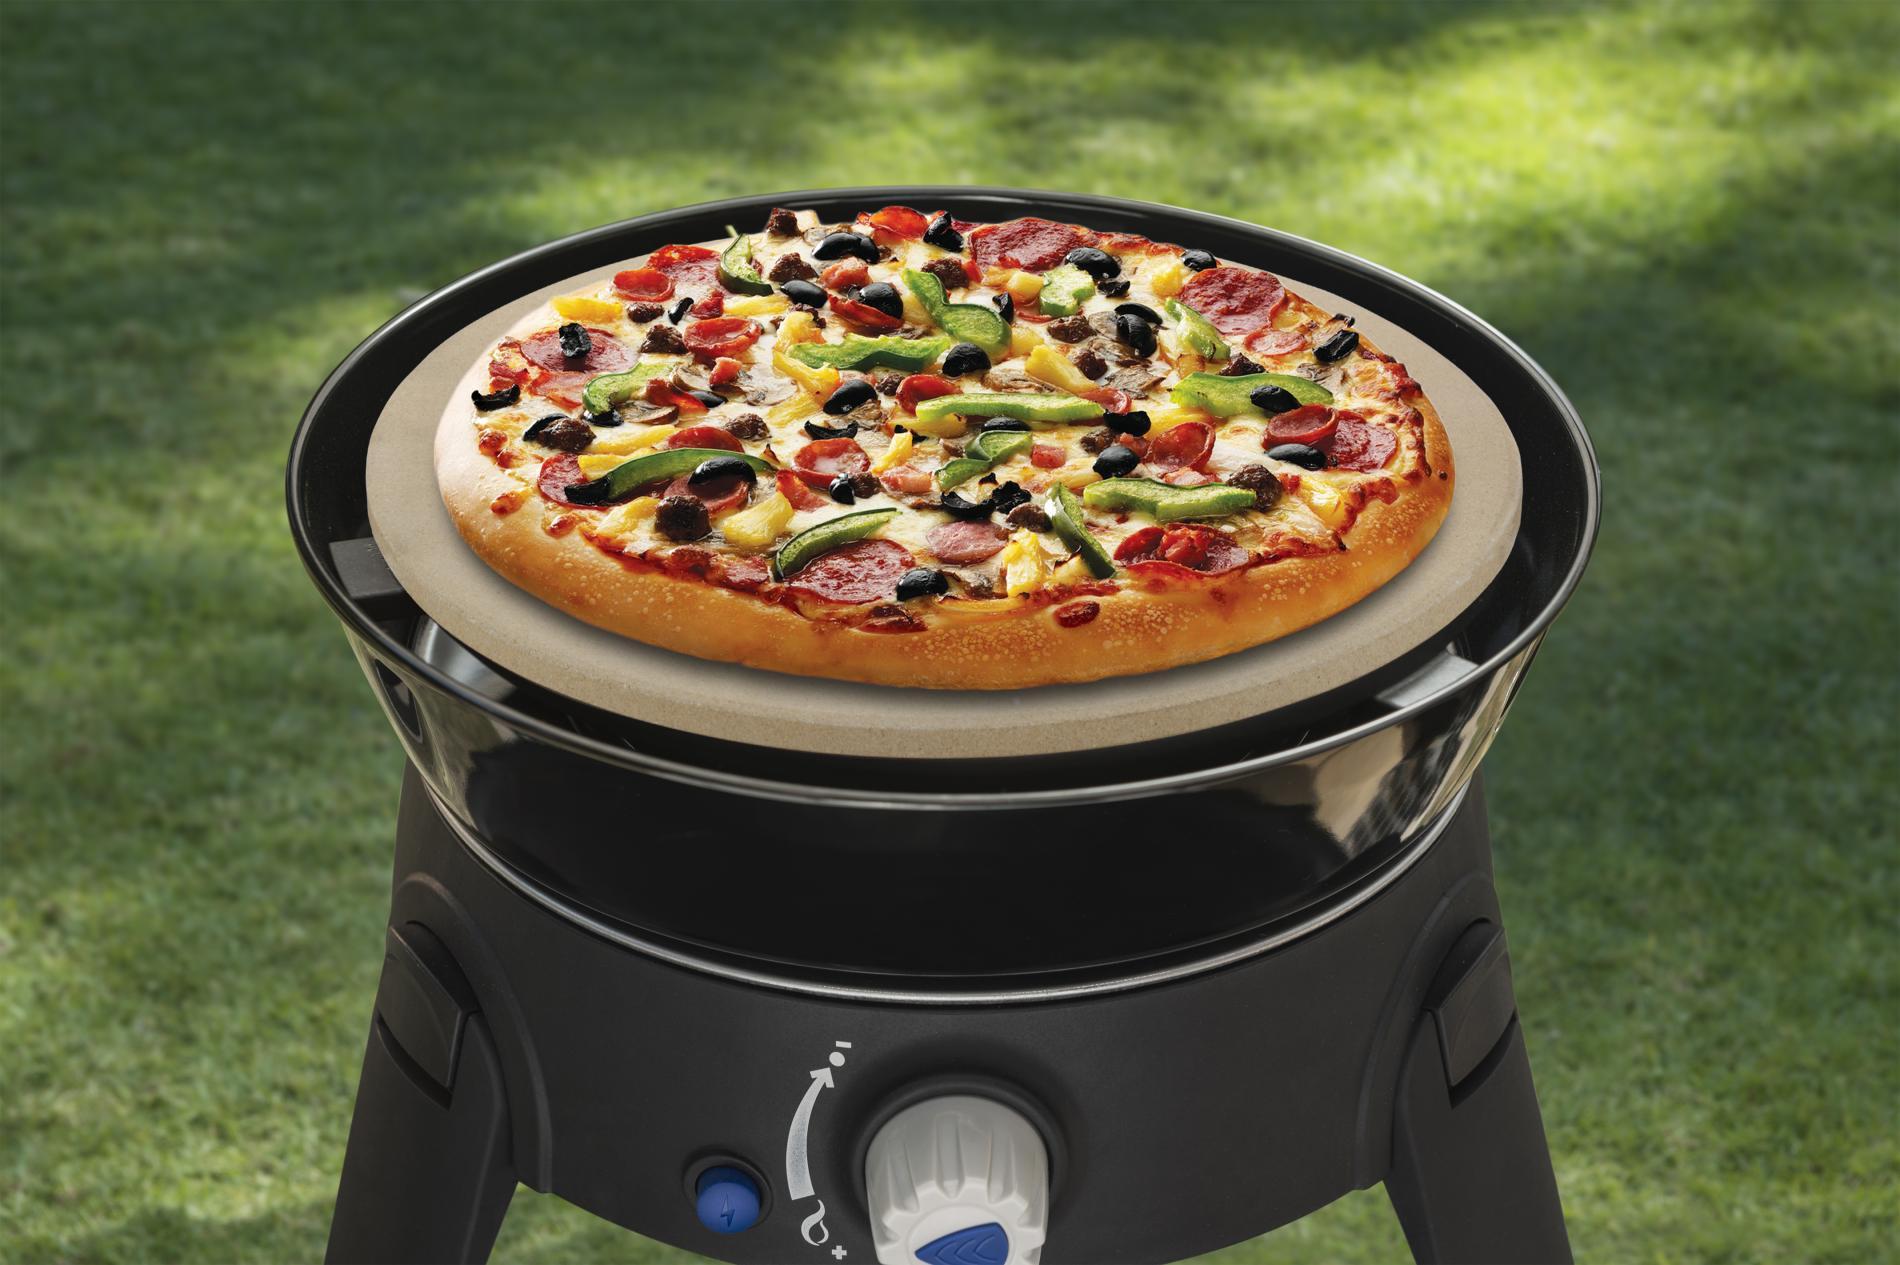 Pizza auf dem Grill – Tipps & Tricks